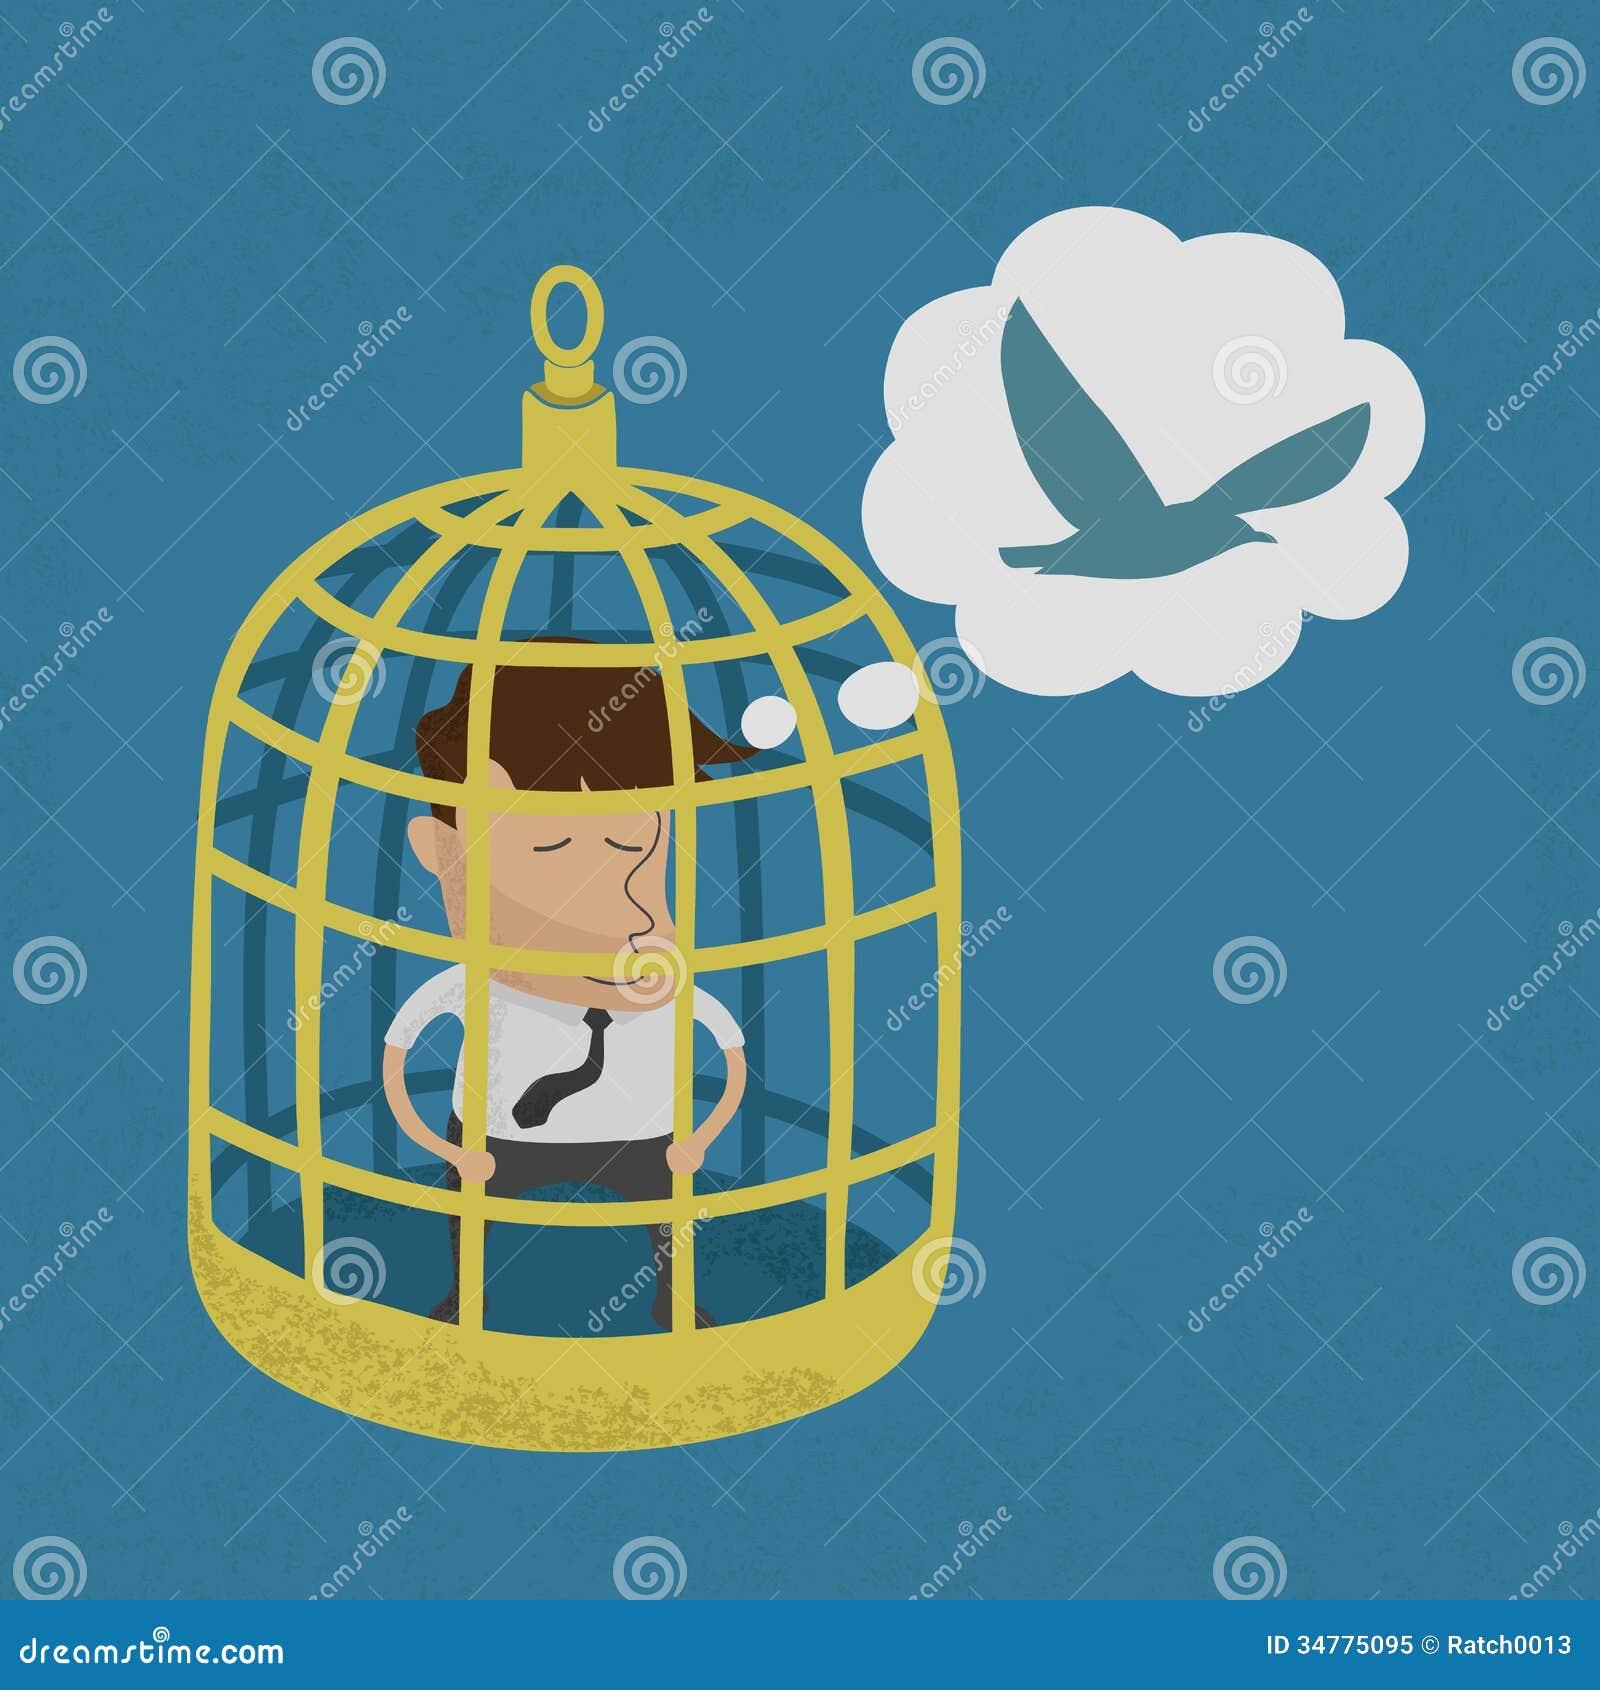 Business Man In Golden Bird Cage Stock Vector Image